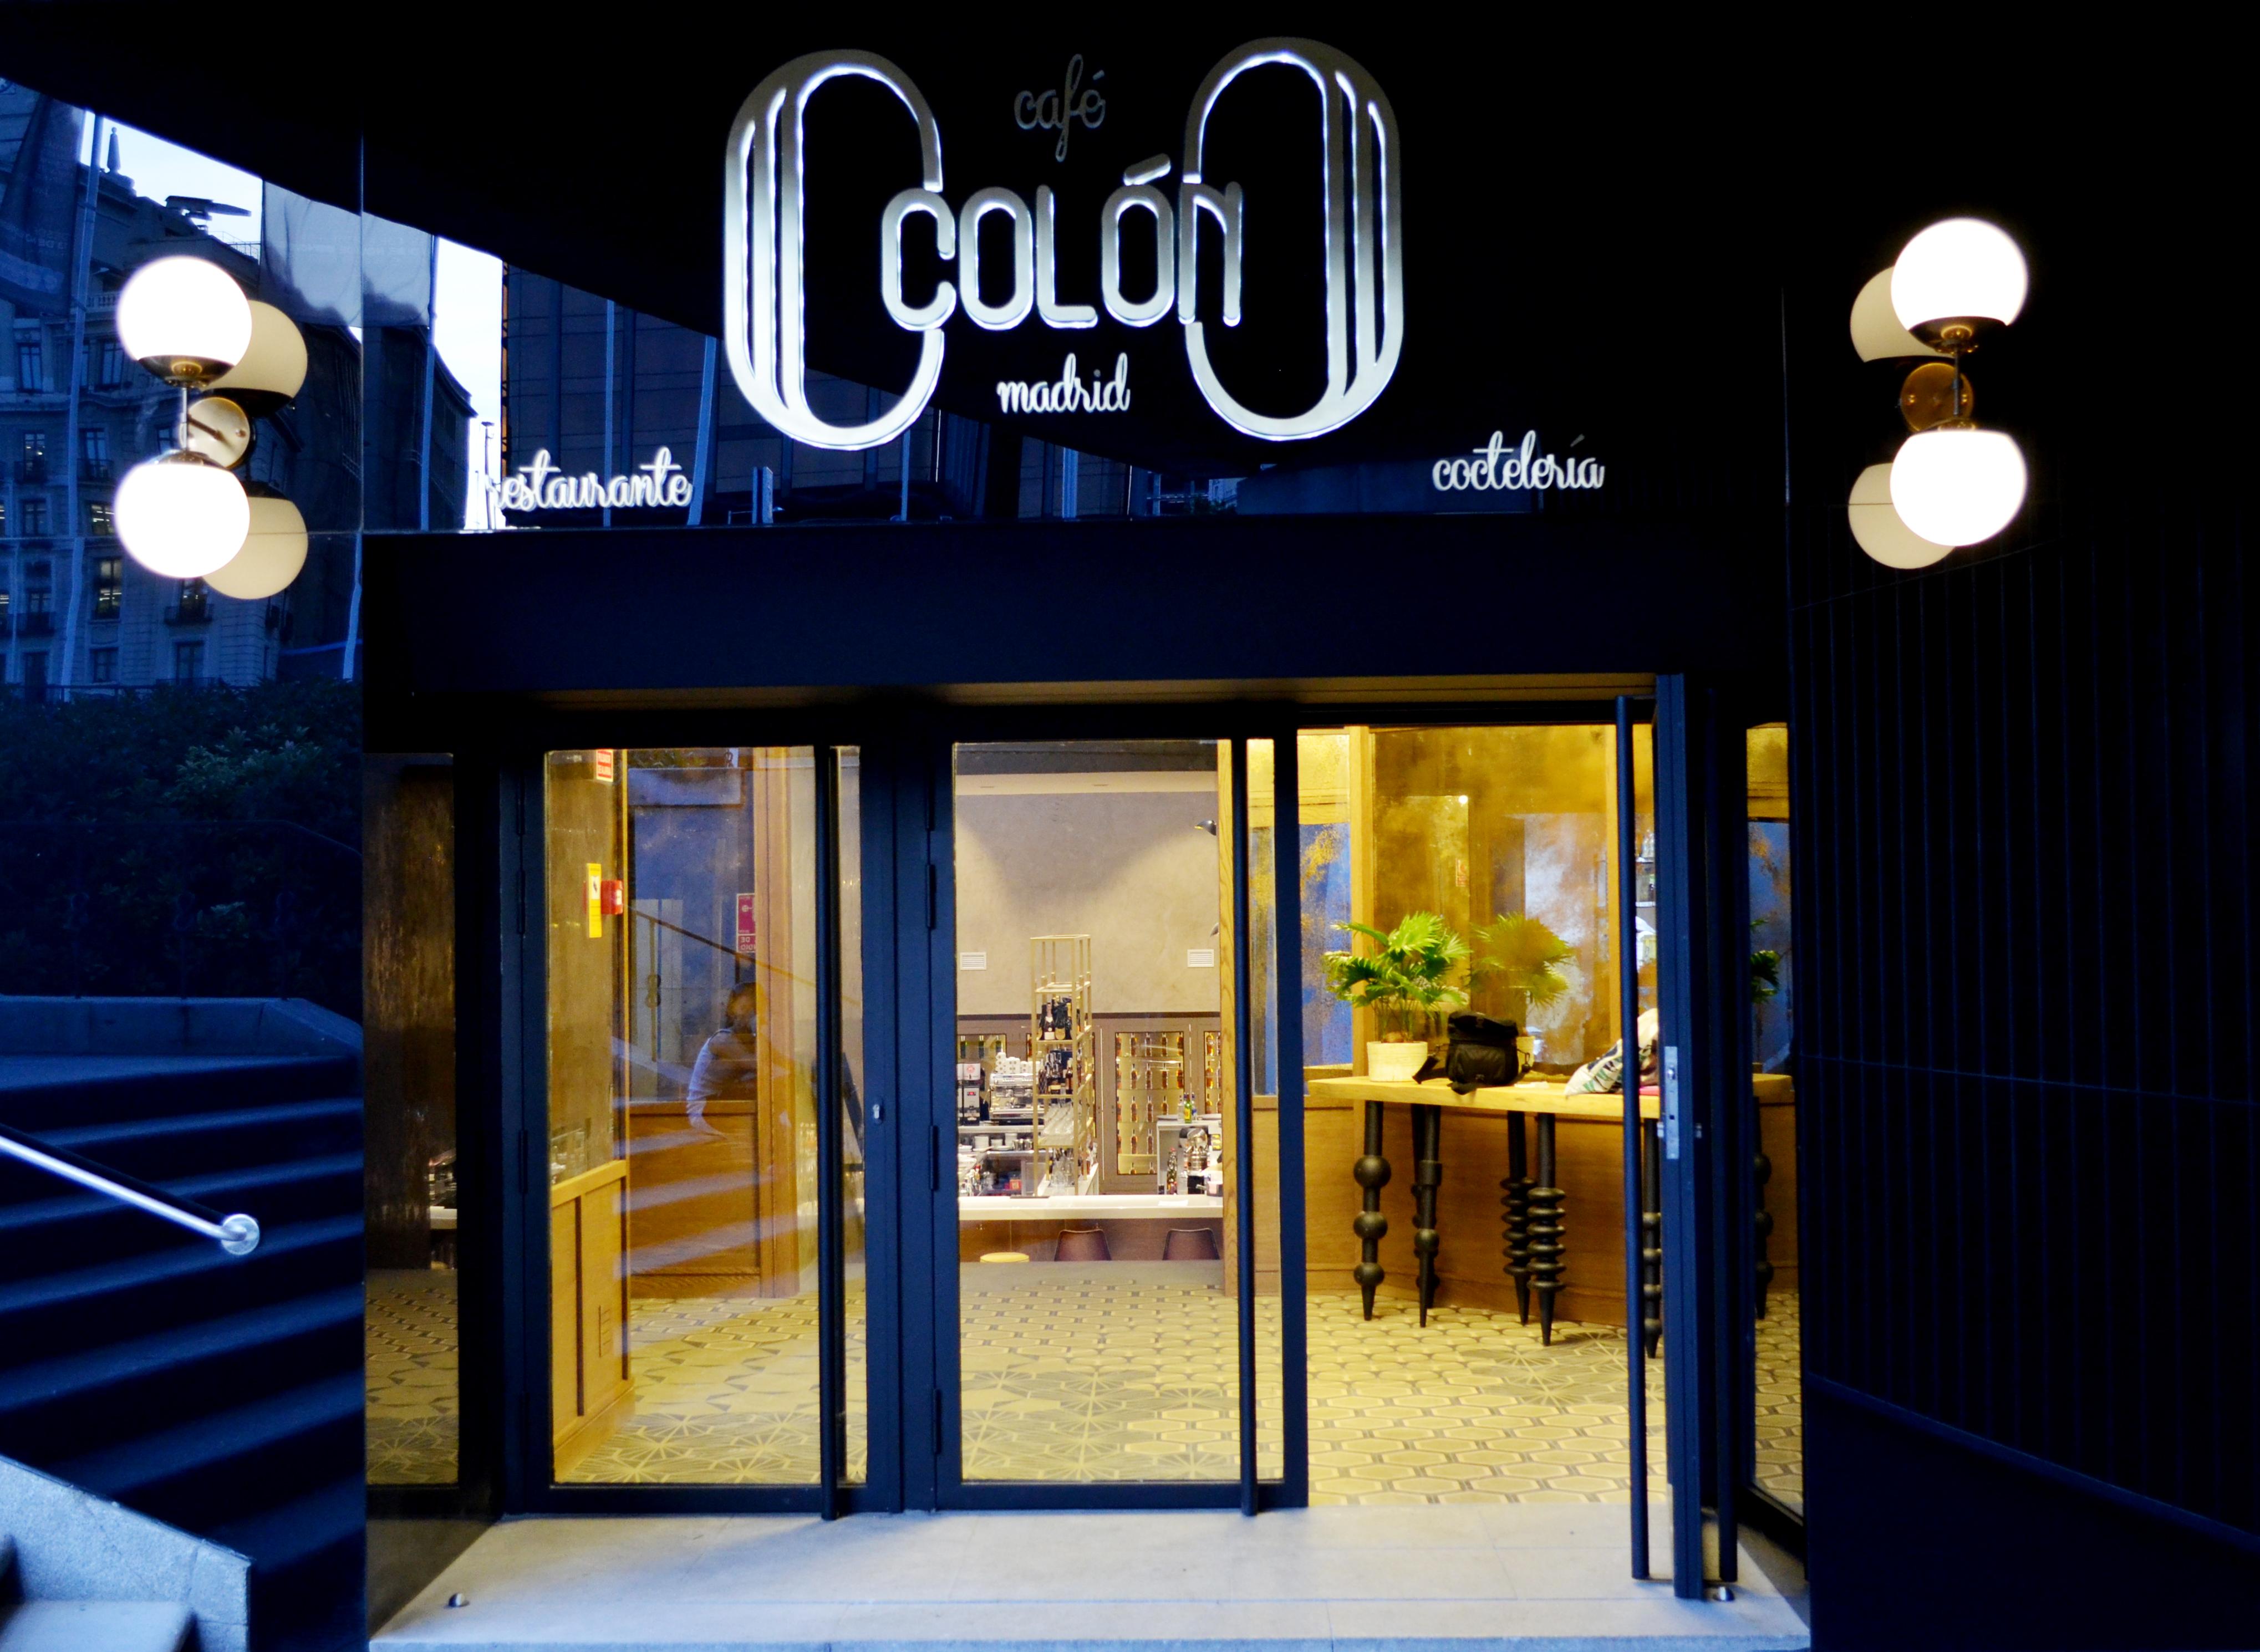 Restaurantes Zona Colón Madrid La Glotona